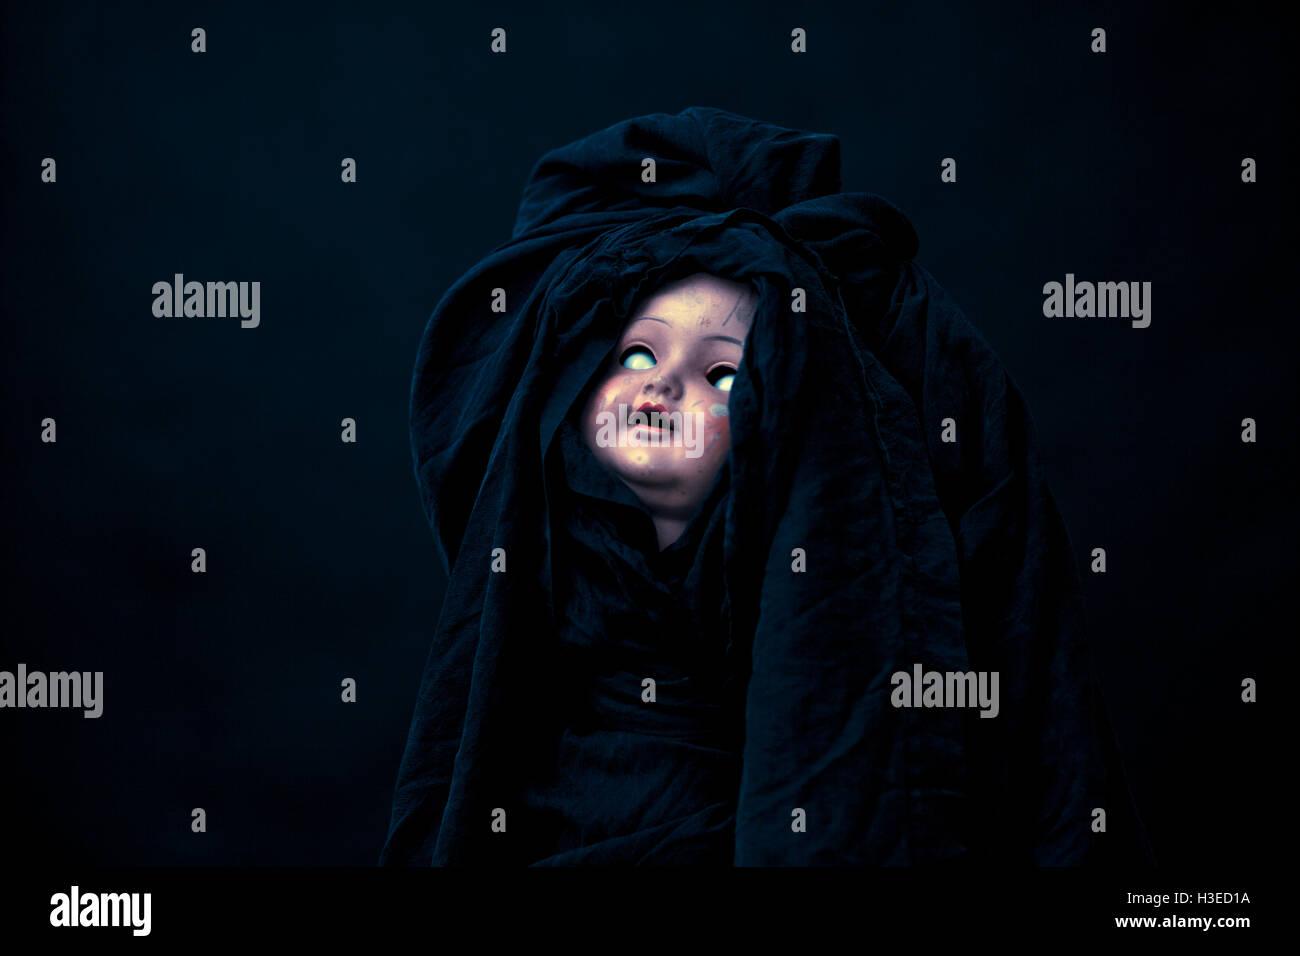 Creepy doll Imagen De Stock